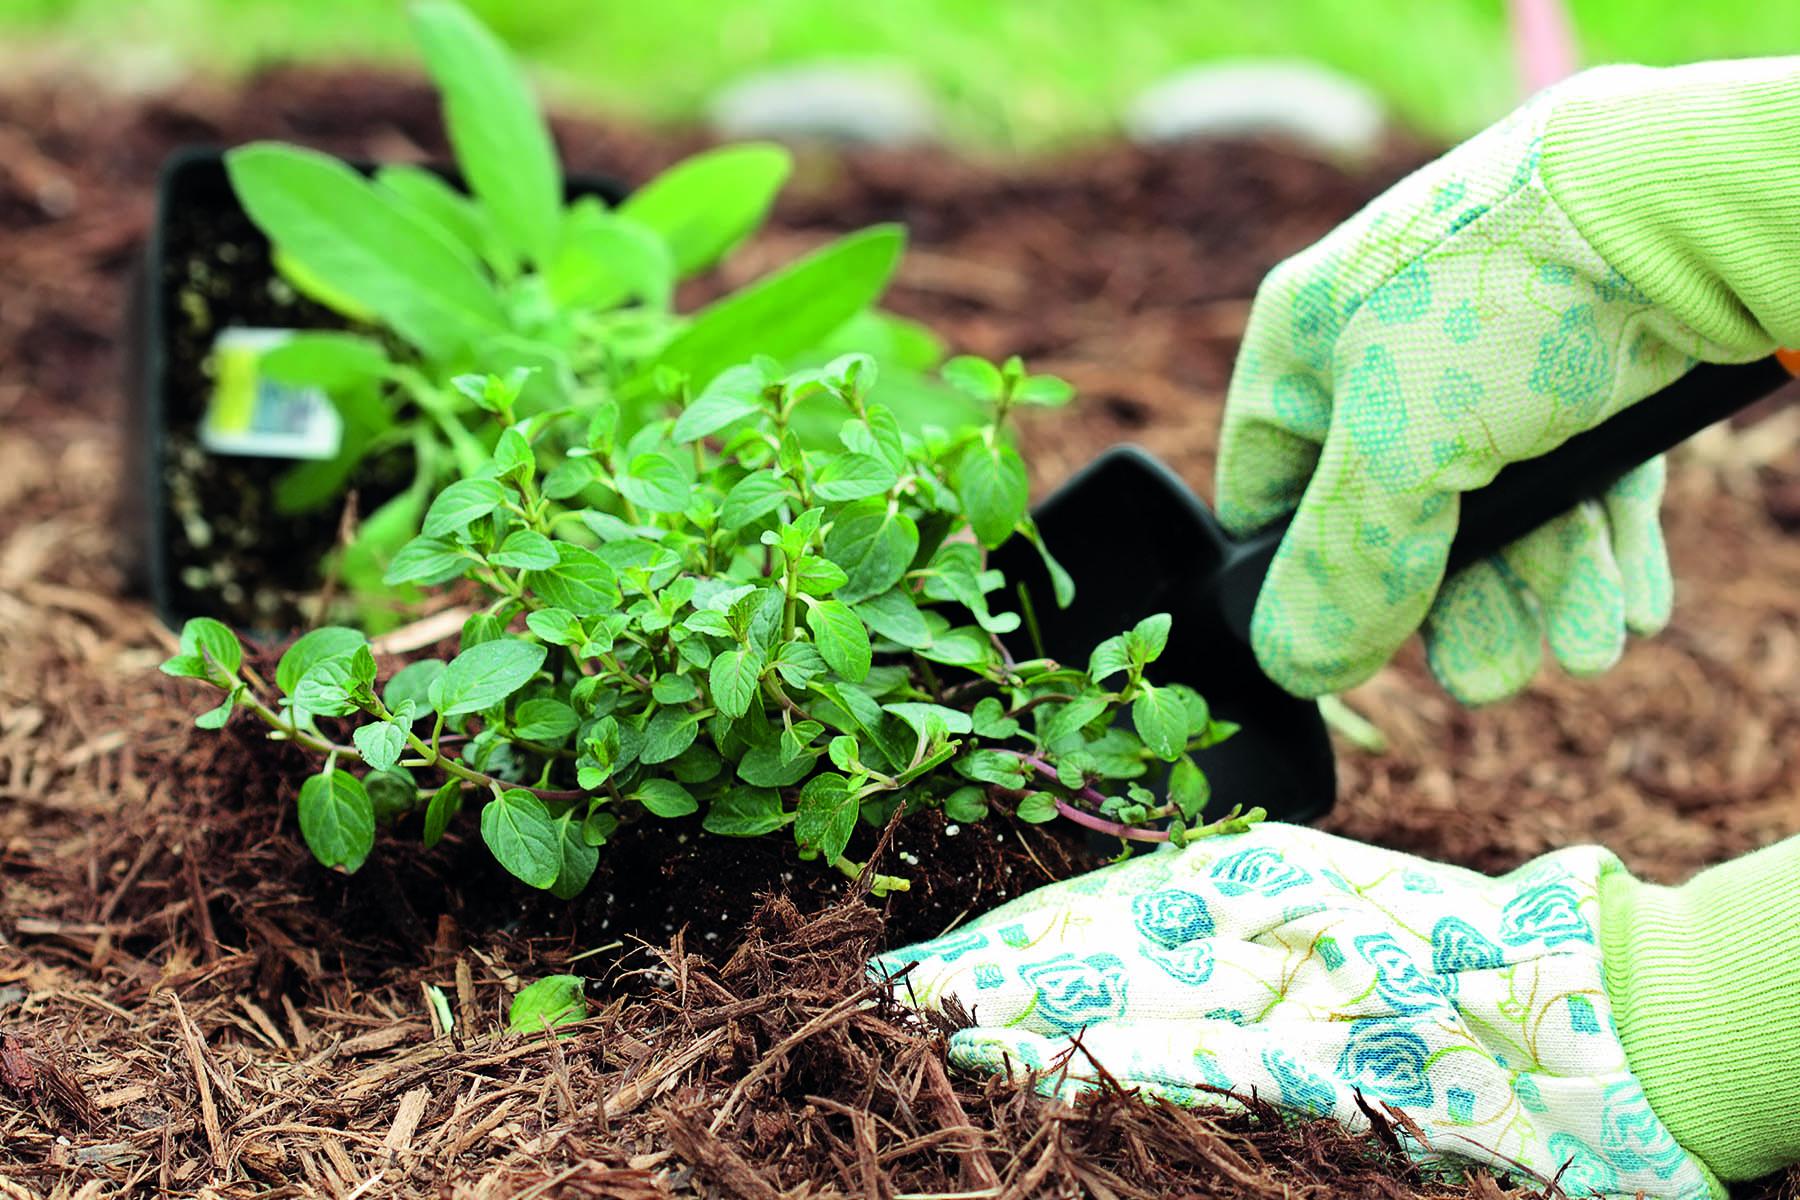 En handskbeklädd hand planterar en planta